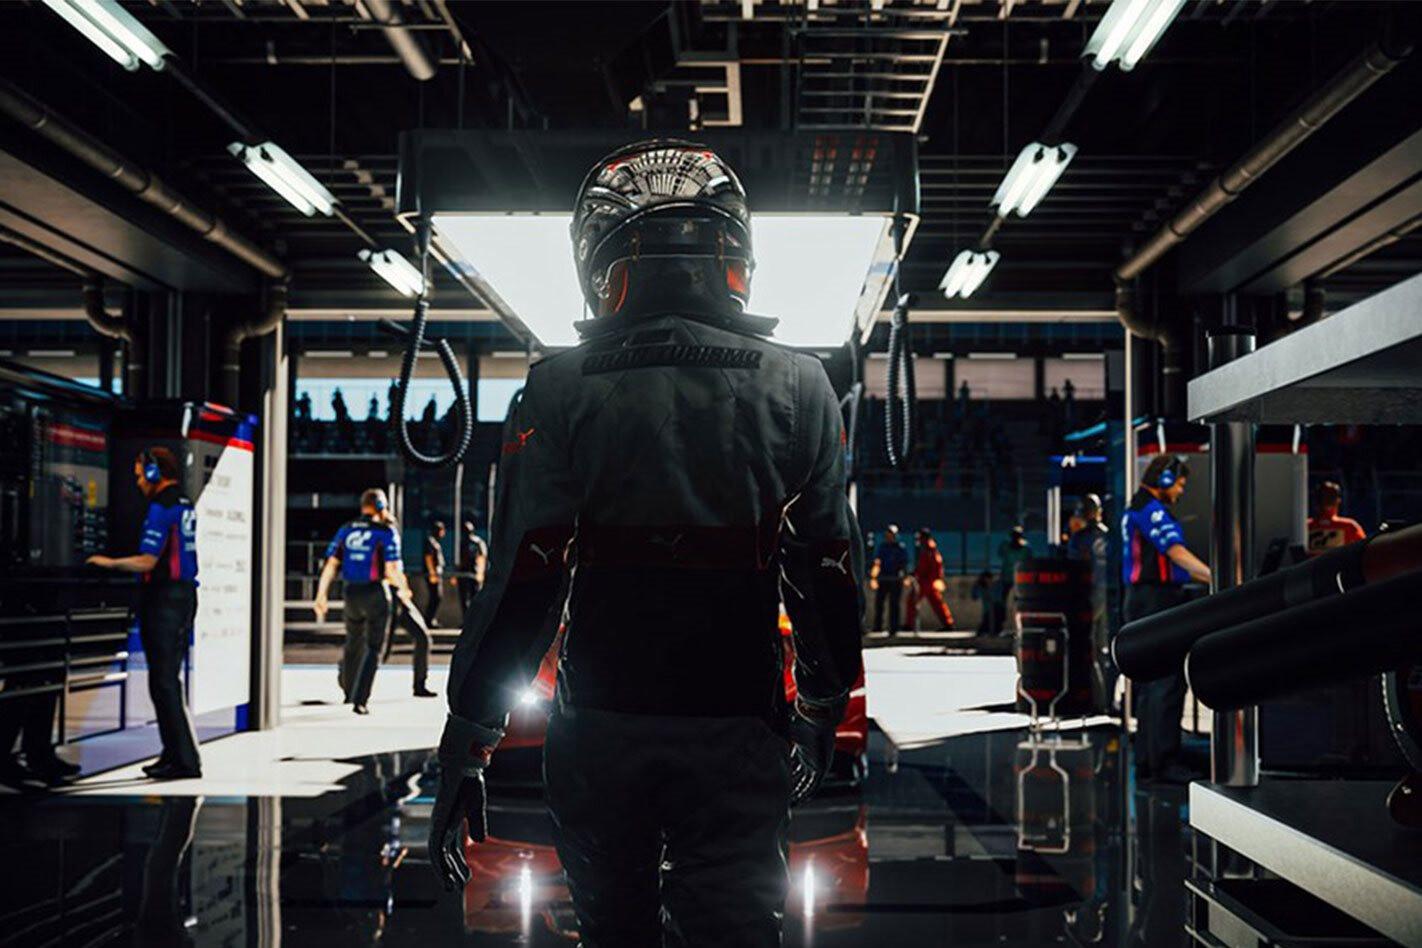 Gran Turismo 7 release date details